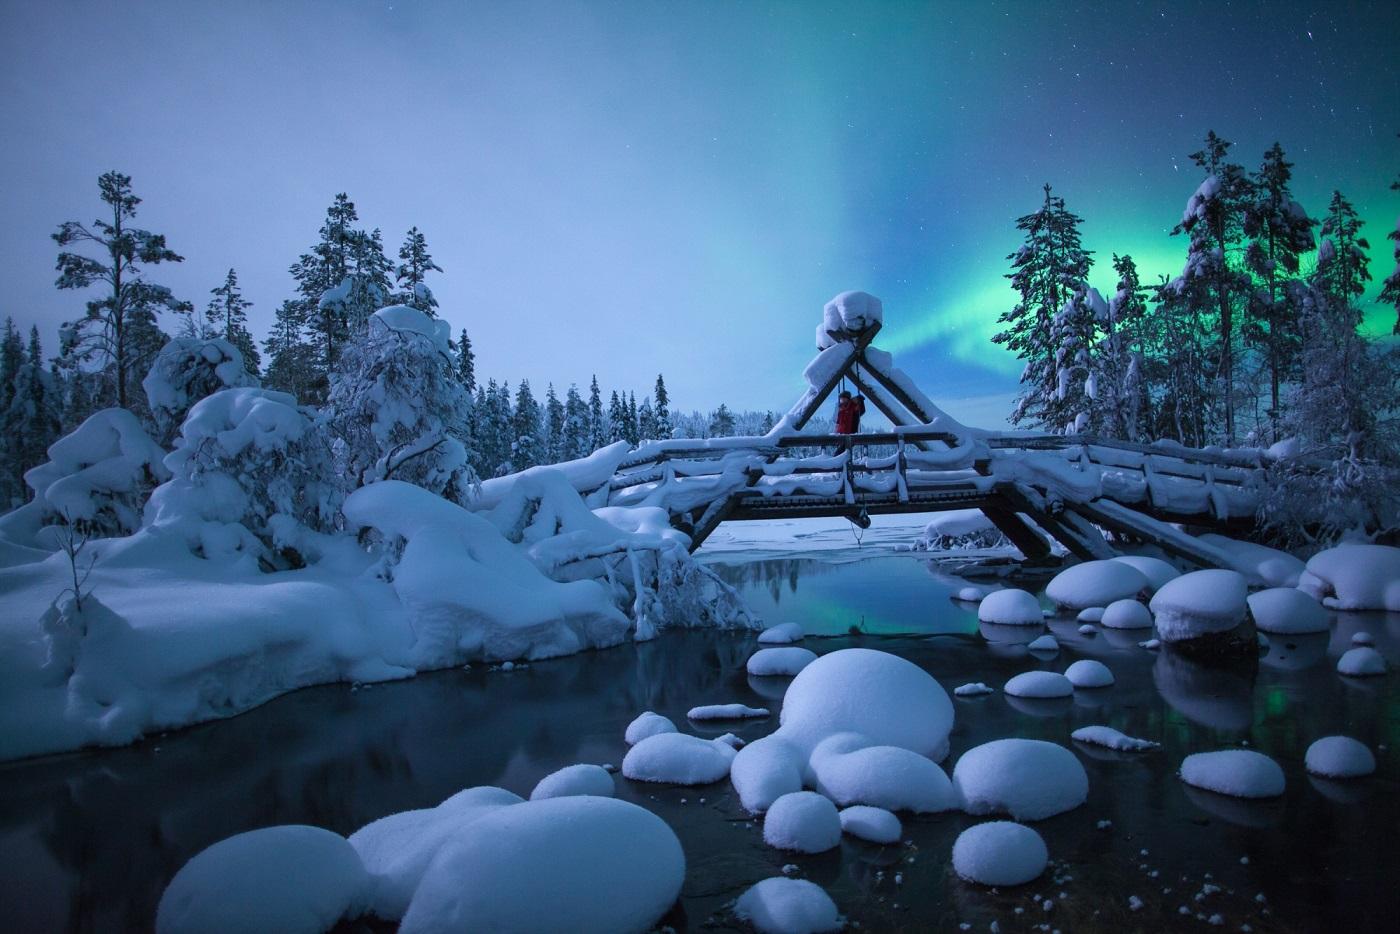 Image 4 www.theaurorazone.com Antti Pietikainen 2